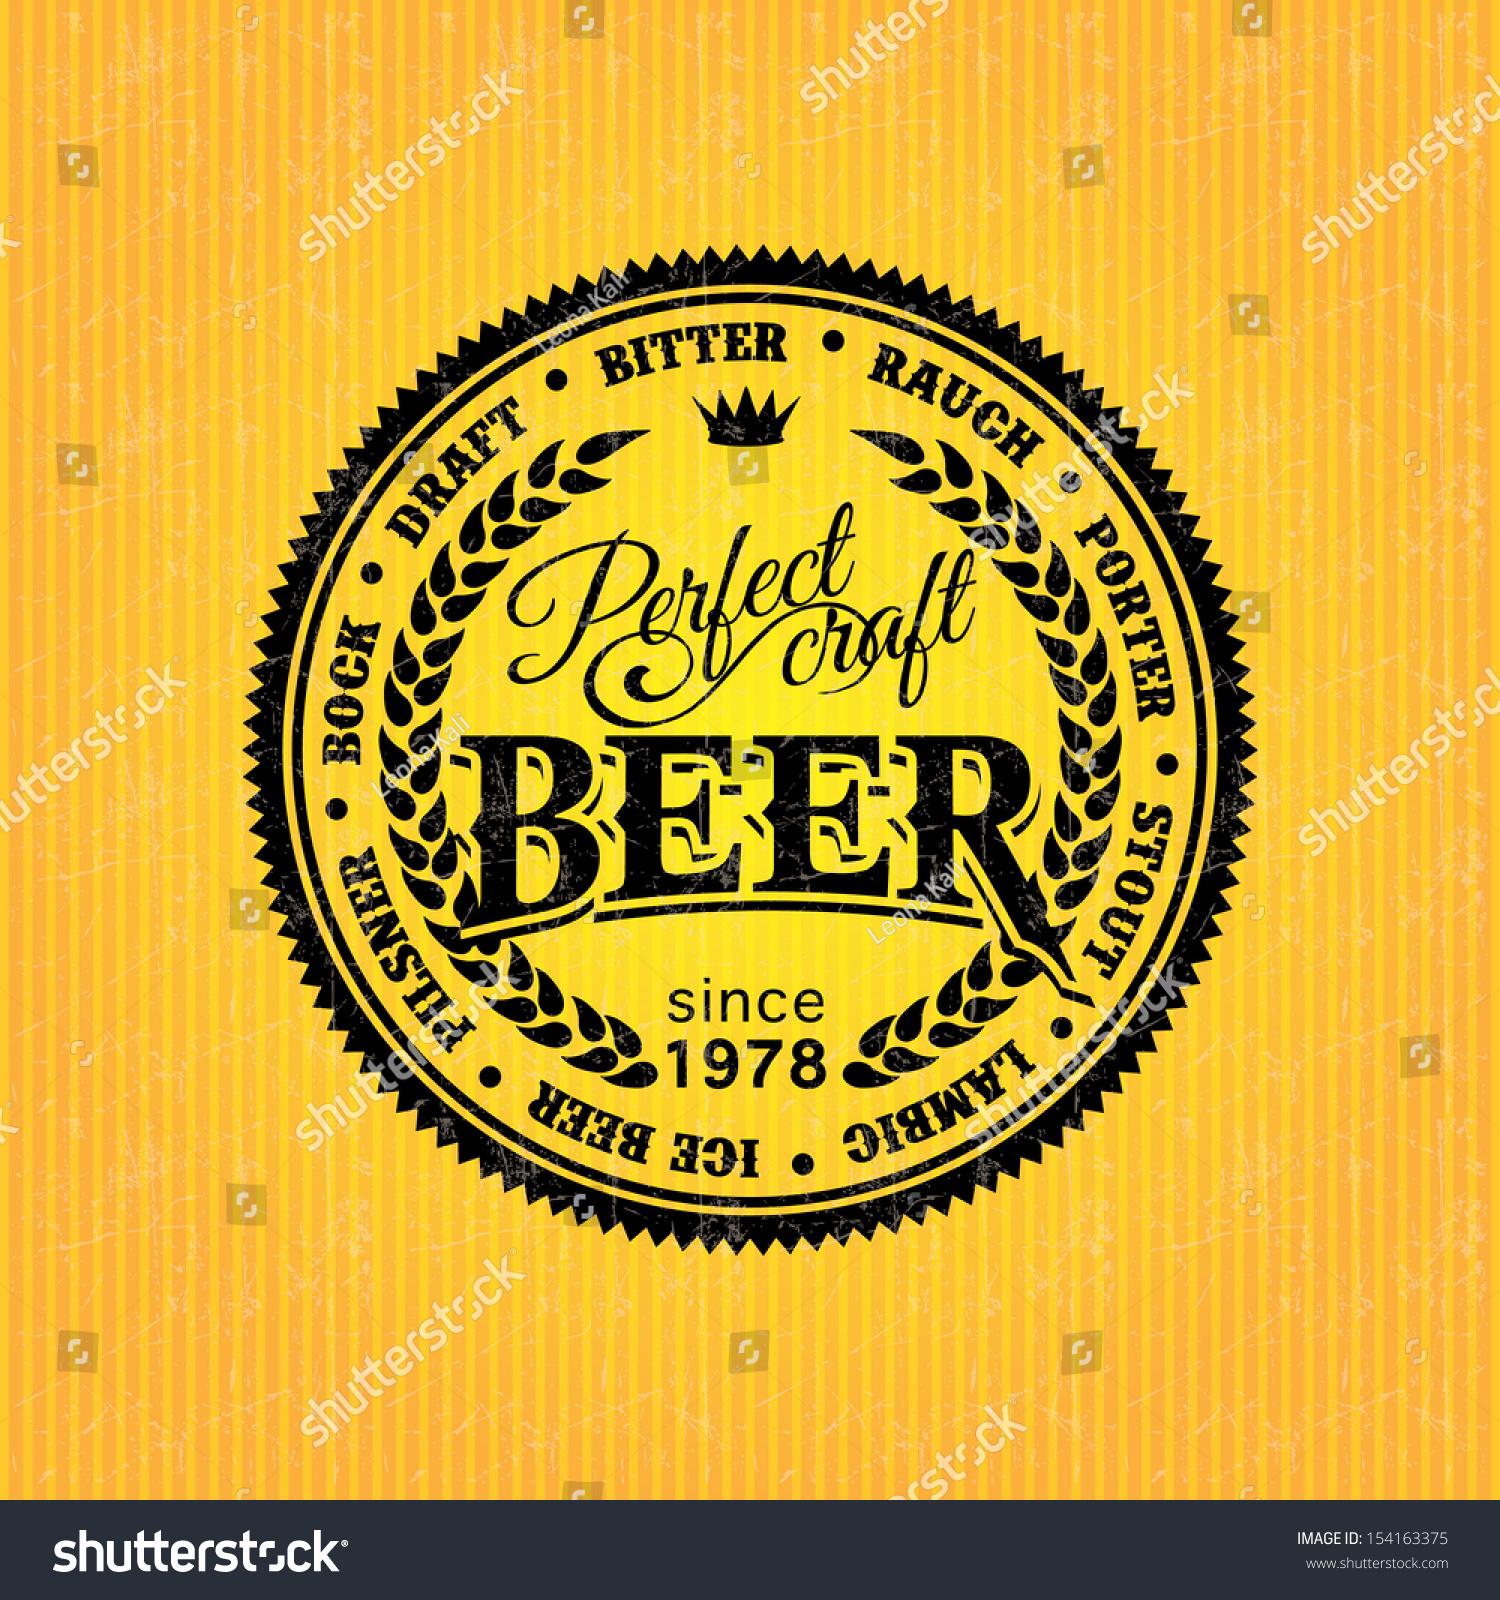 beer label design template stock vector 154163375 shutterstock. Black Bedroom Furniture Sets. Home Design Ideas